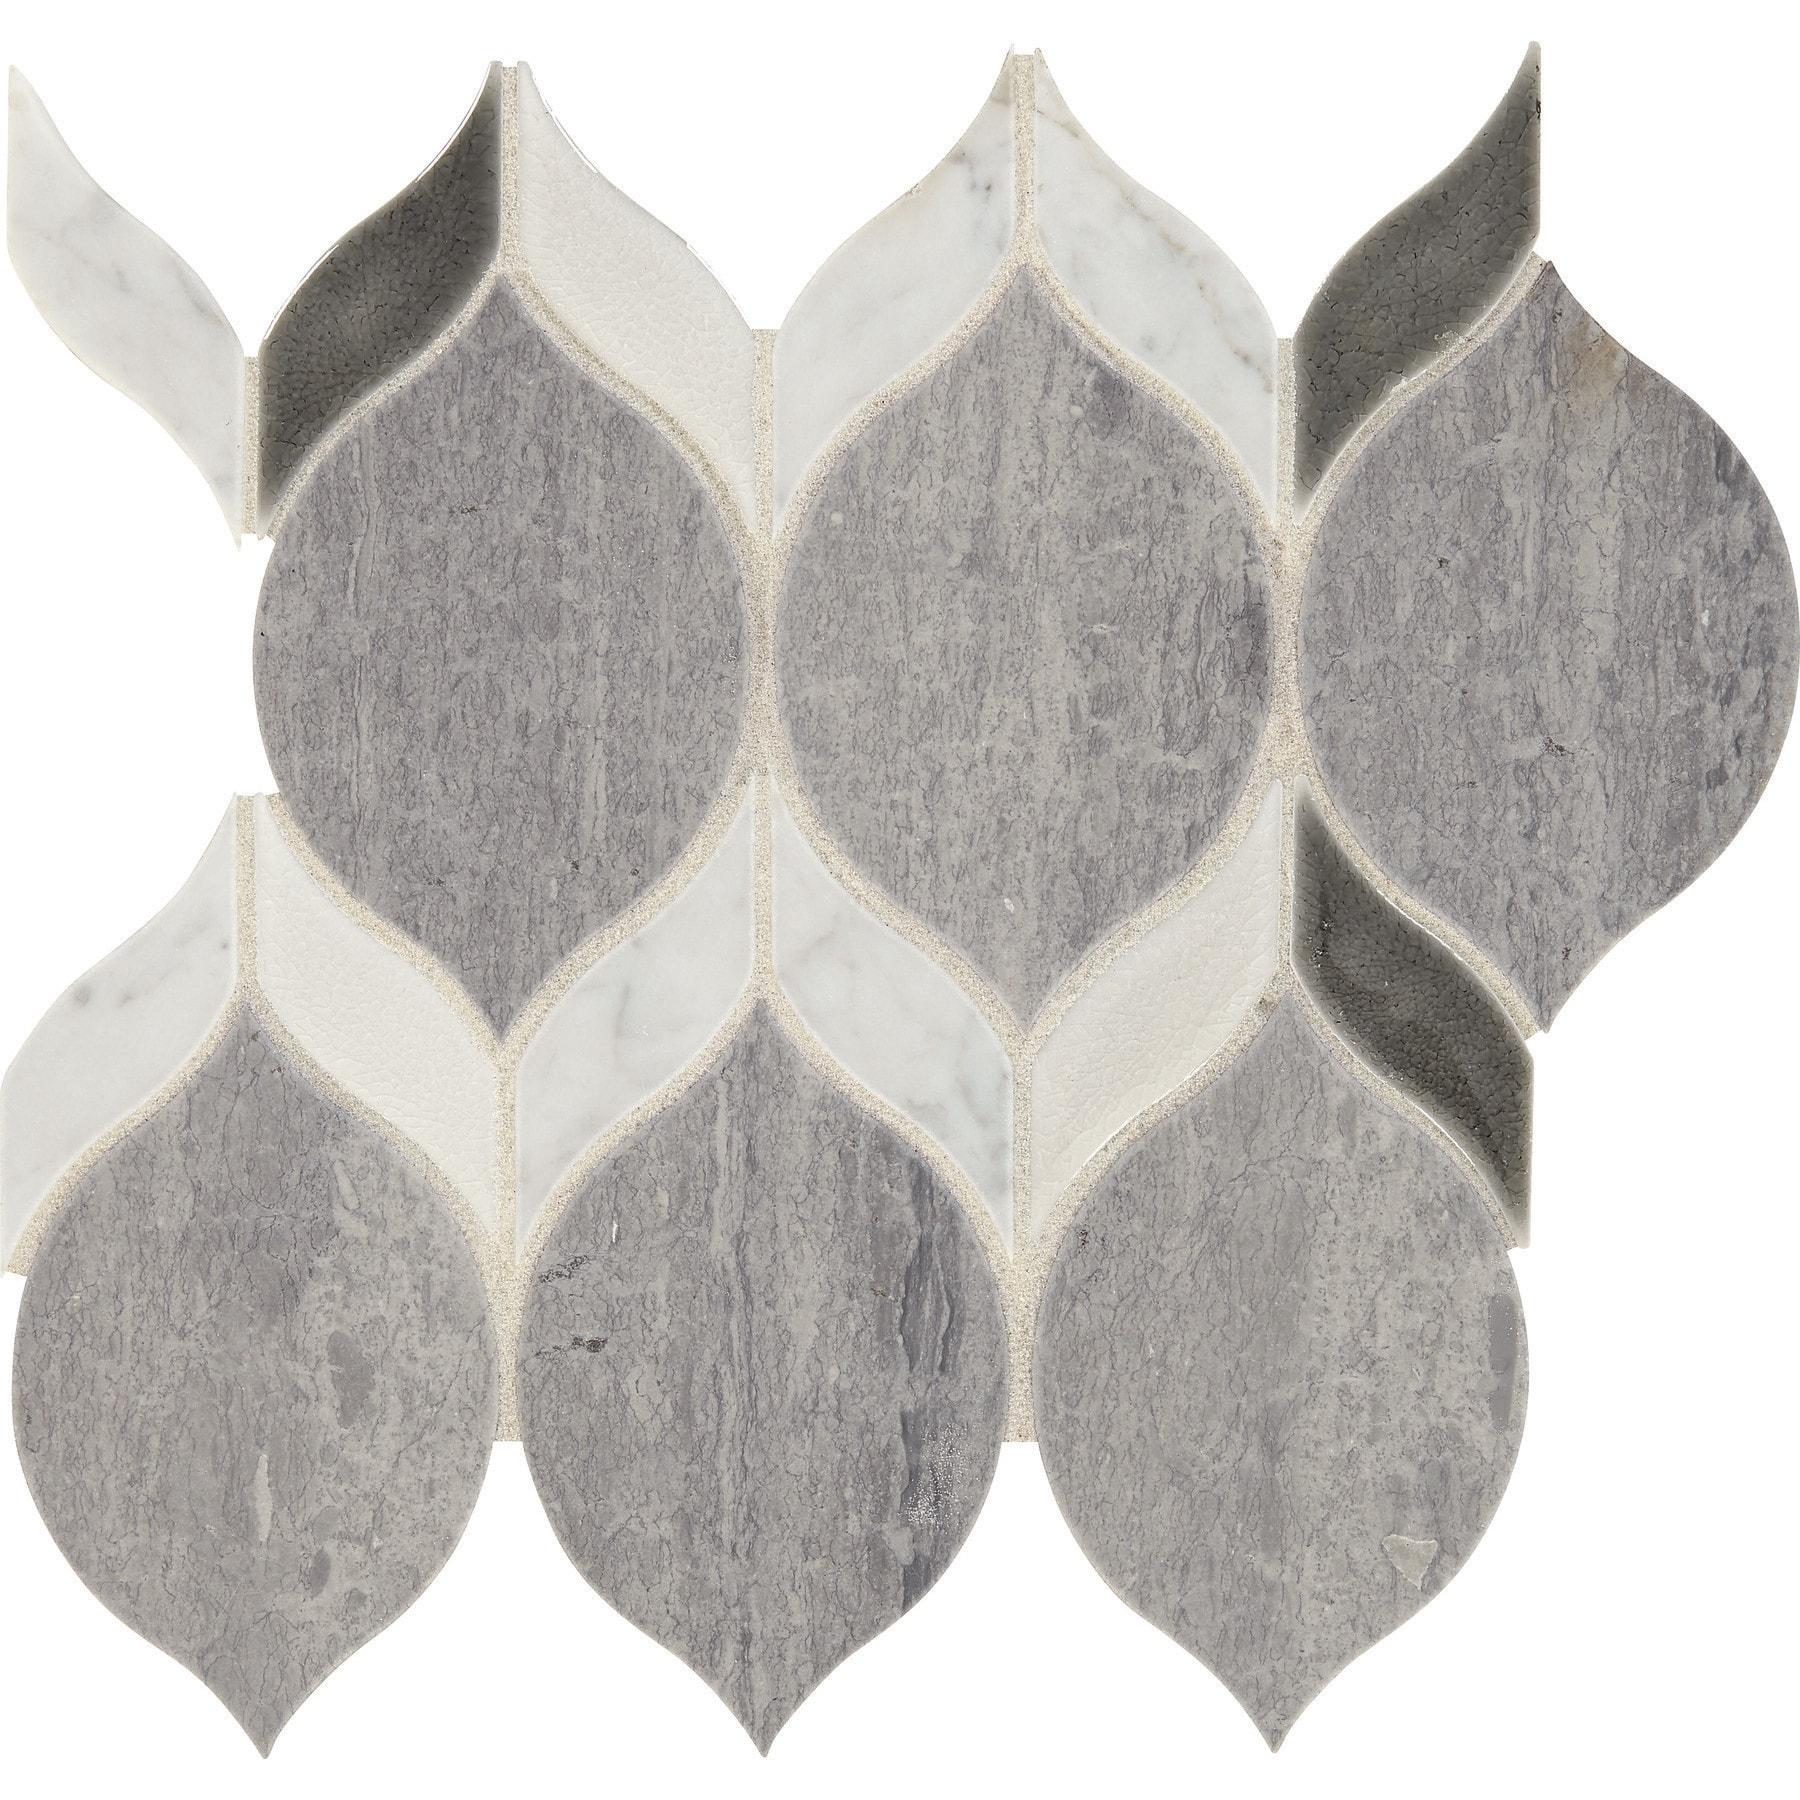 Daltile Dadblleafms1p Fonte 3 X 6 Marque Rain Drop Mosaic Wall Overstock 30302988